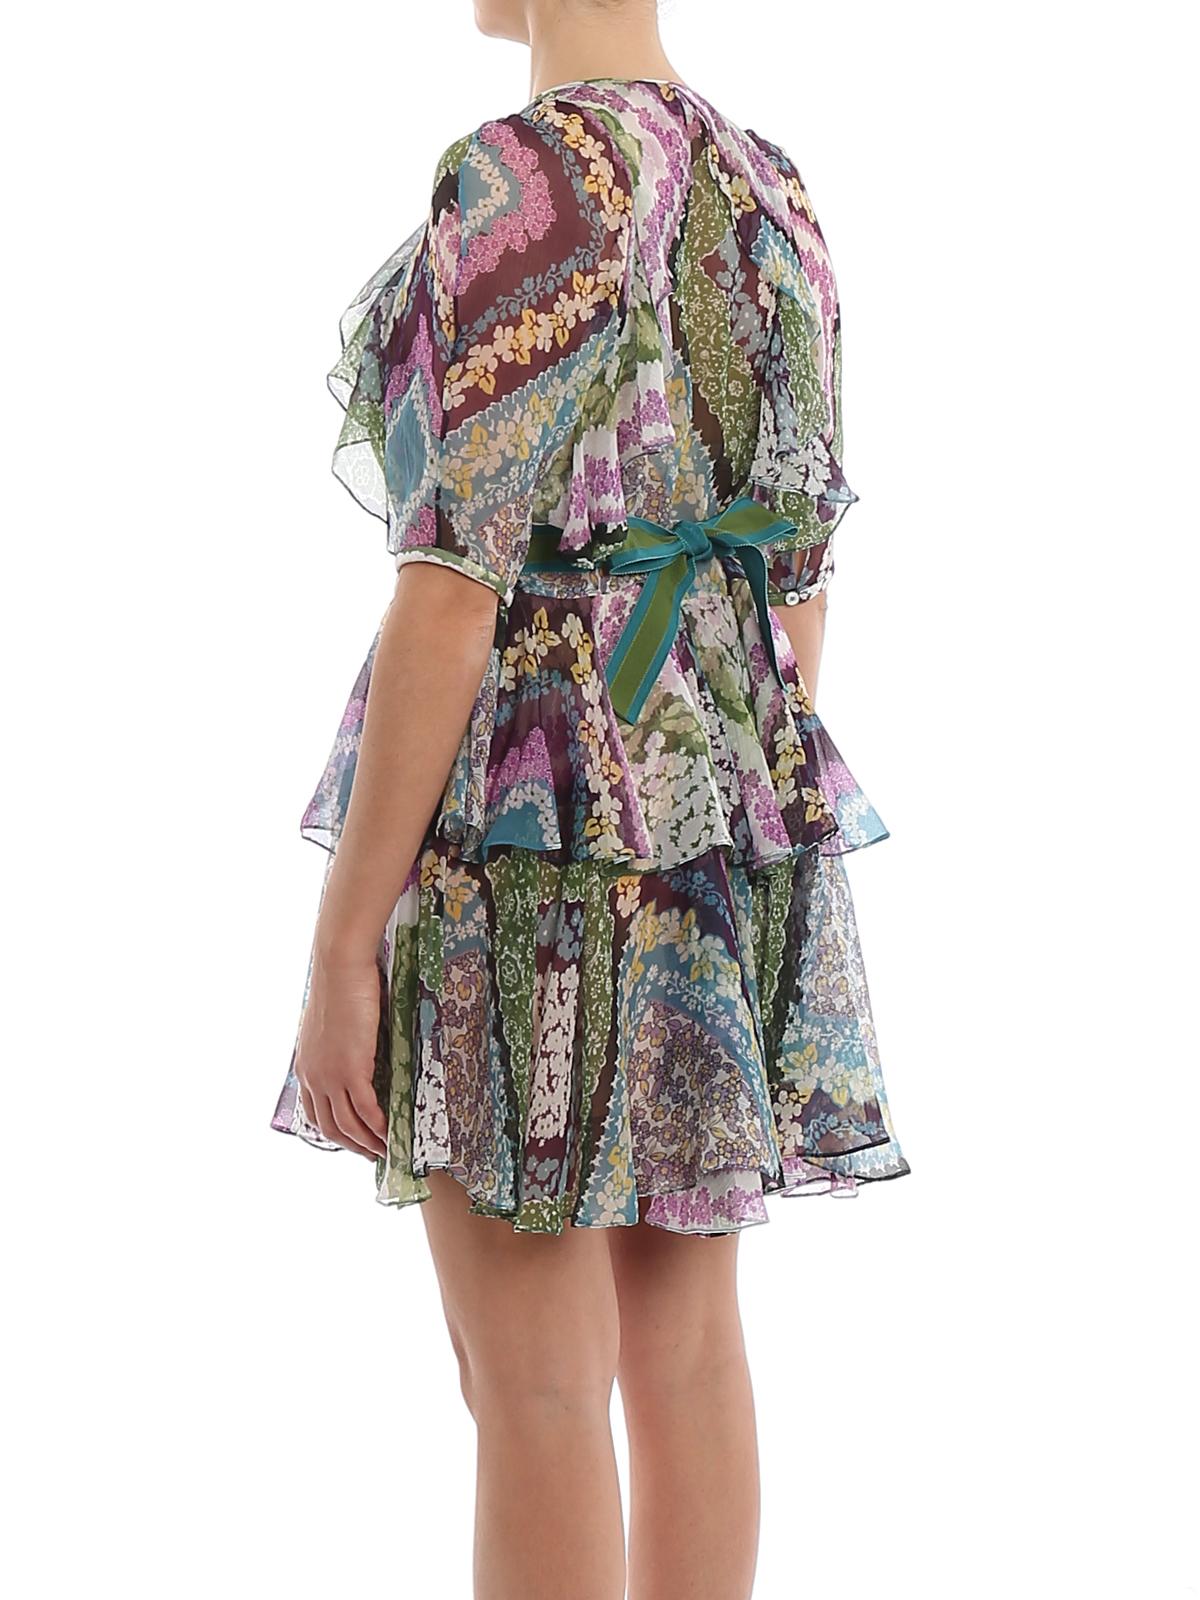 Floral printed silk georgette Delilah dress DSQUARED2 | 11 | S75CV0181S52496001S